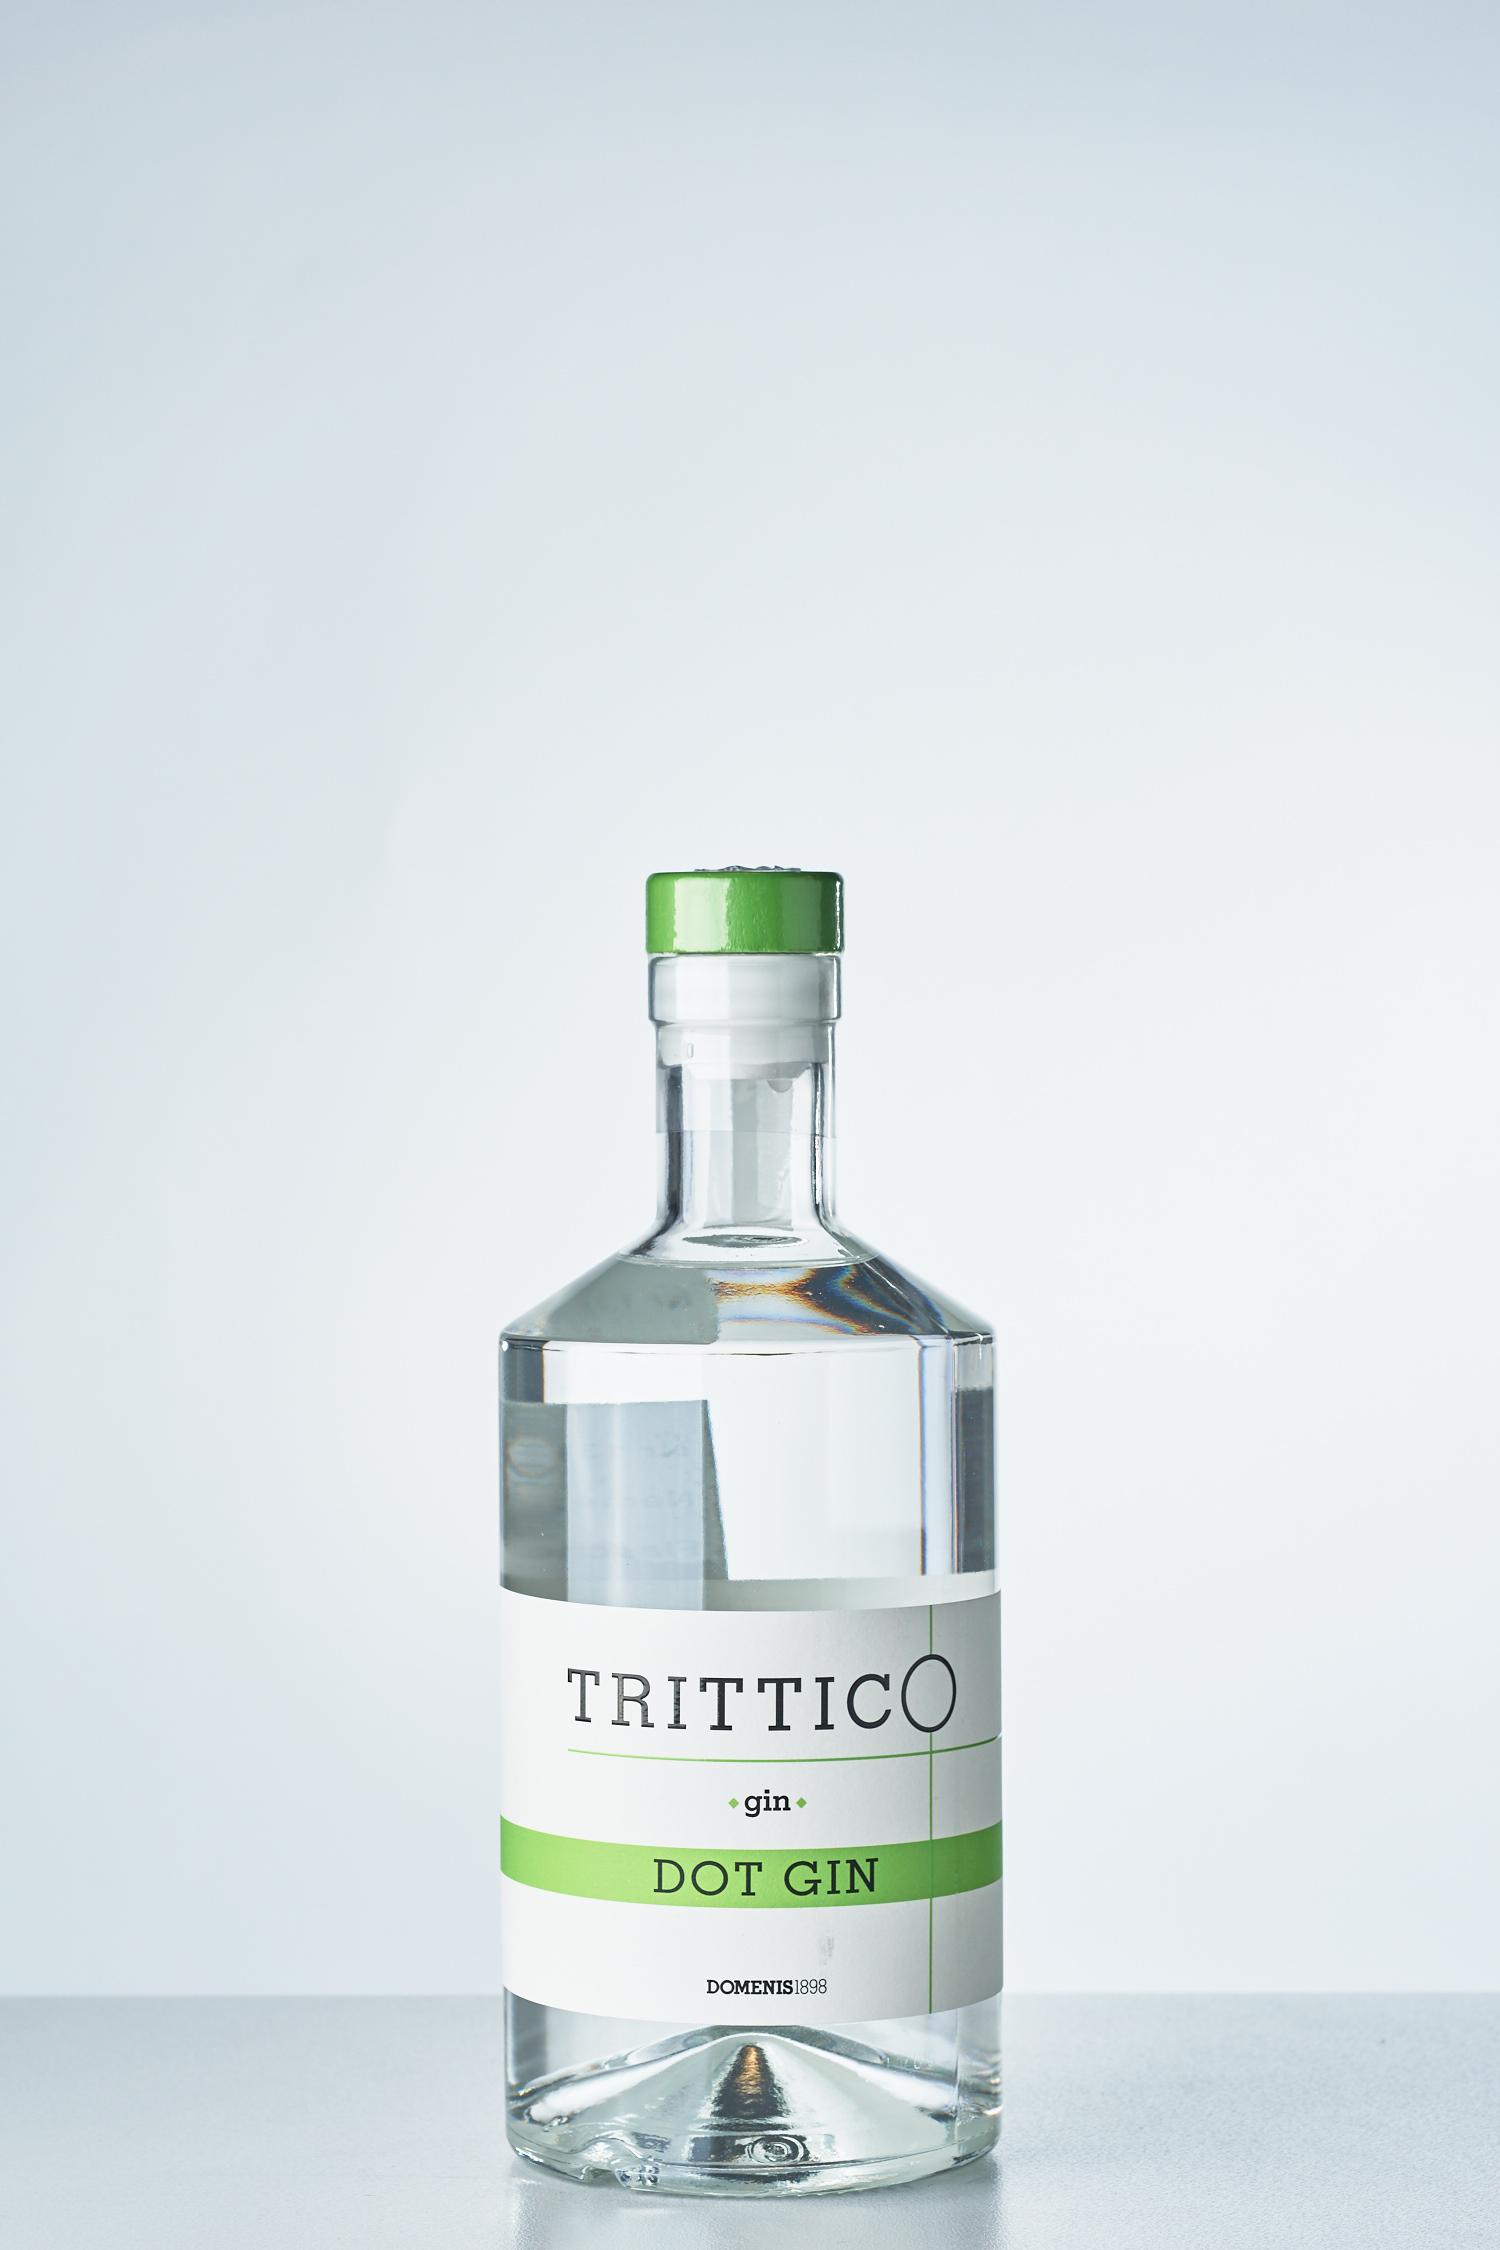 DOMENIS1898 SRL - Trittico Dot-Gin